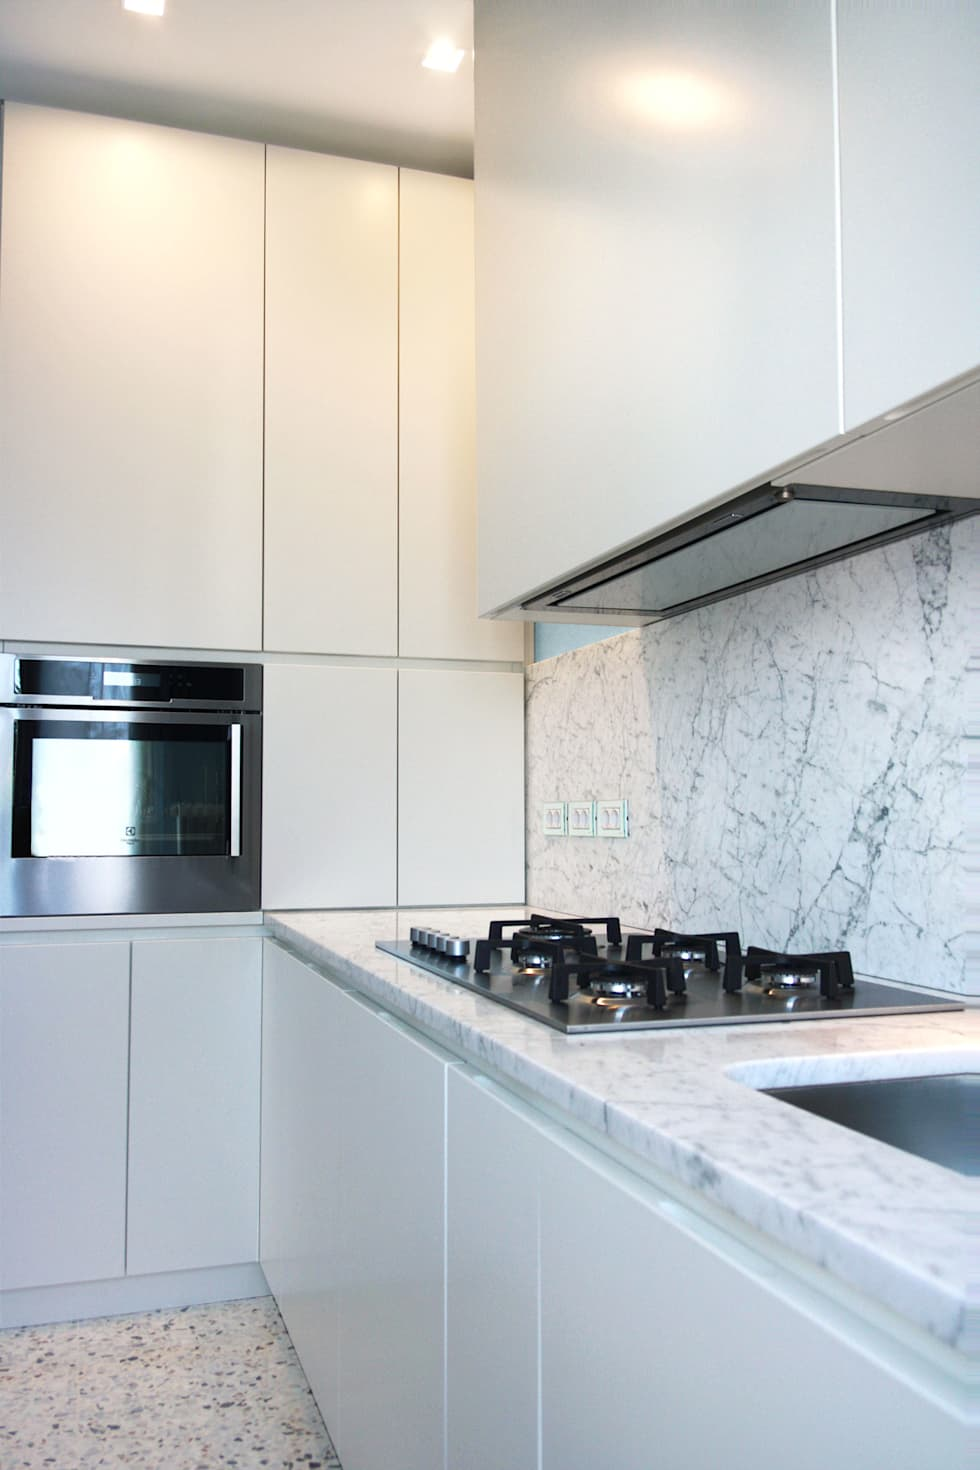 Awesome Cucina Stile Anni 50 Photos - Home Interior Ideas ...